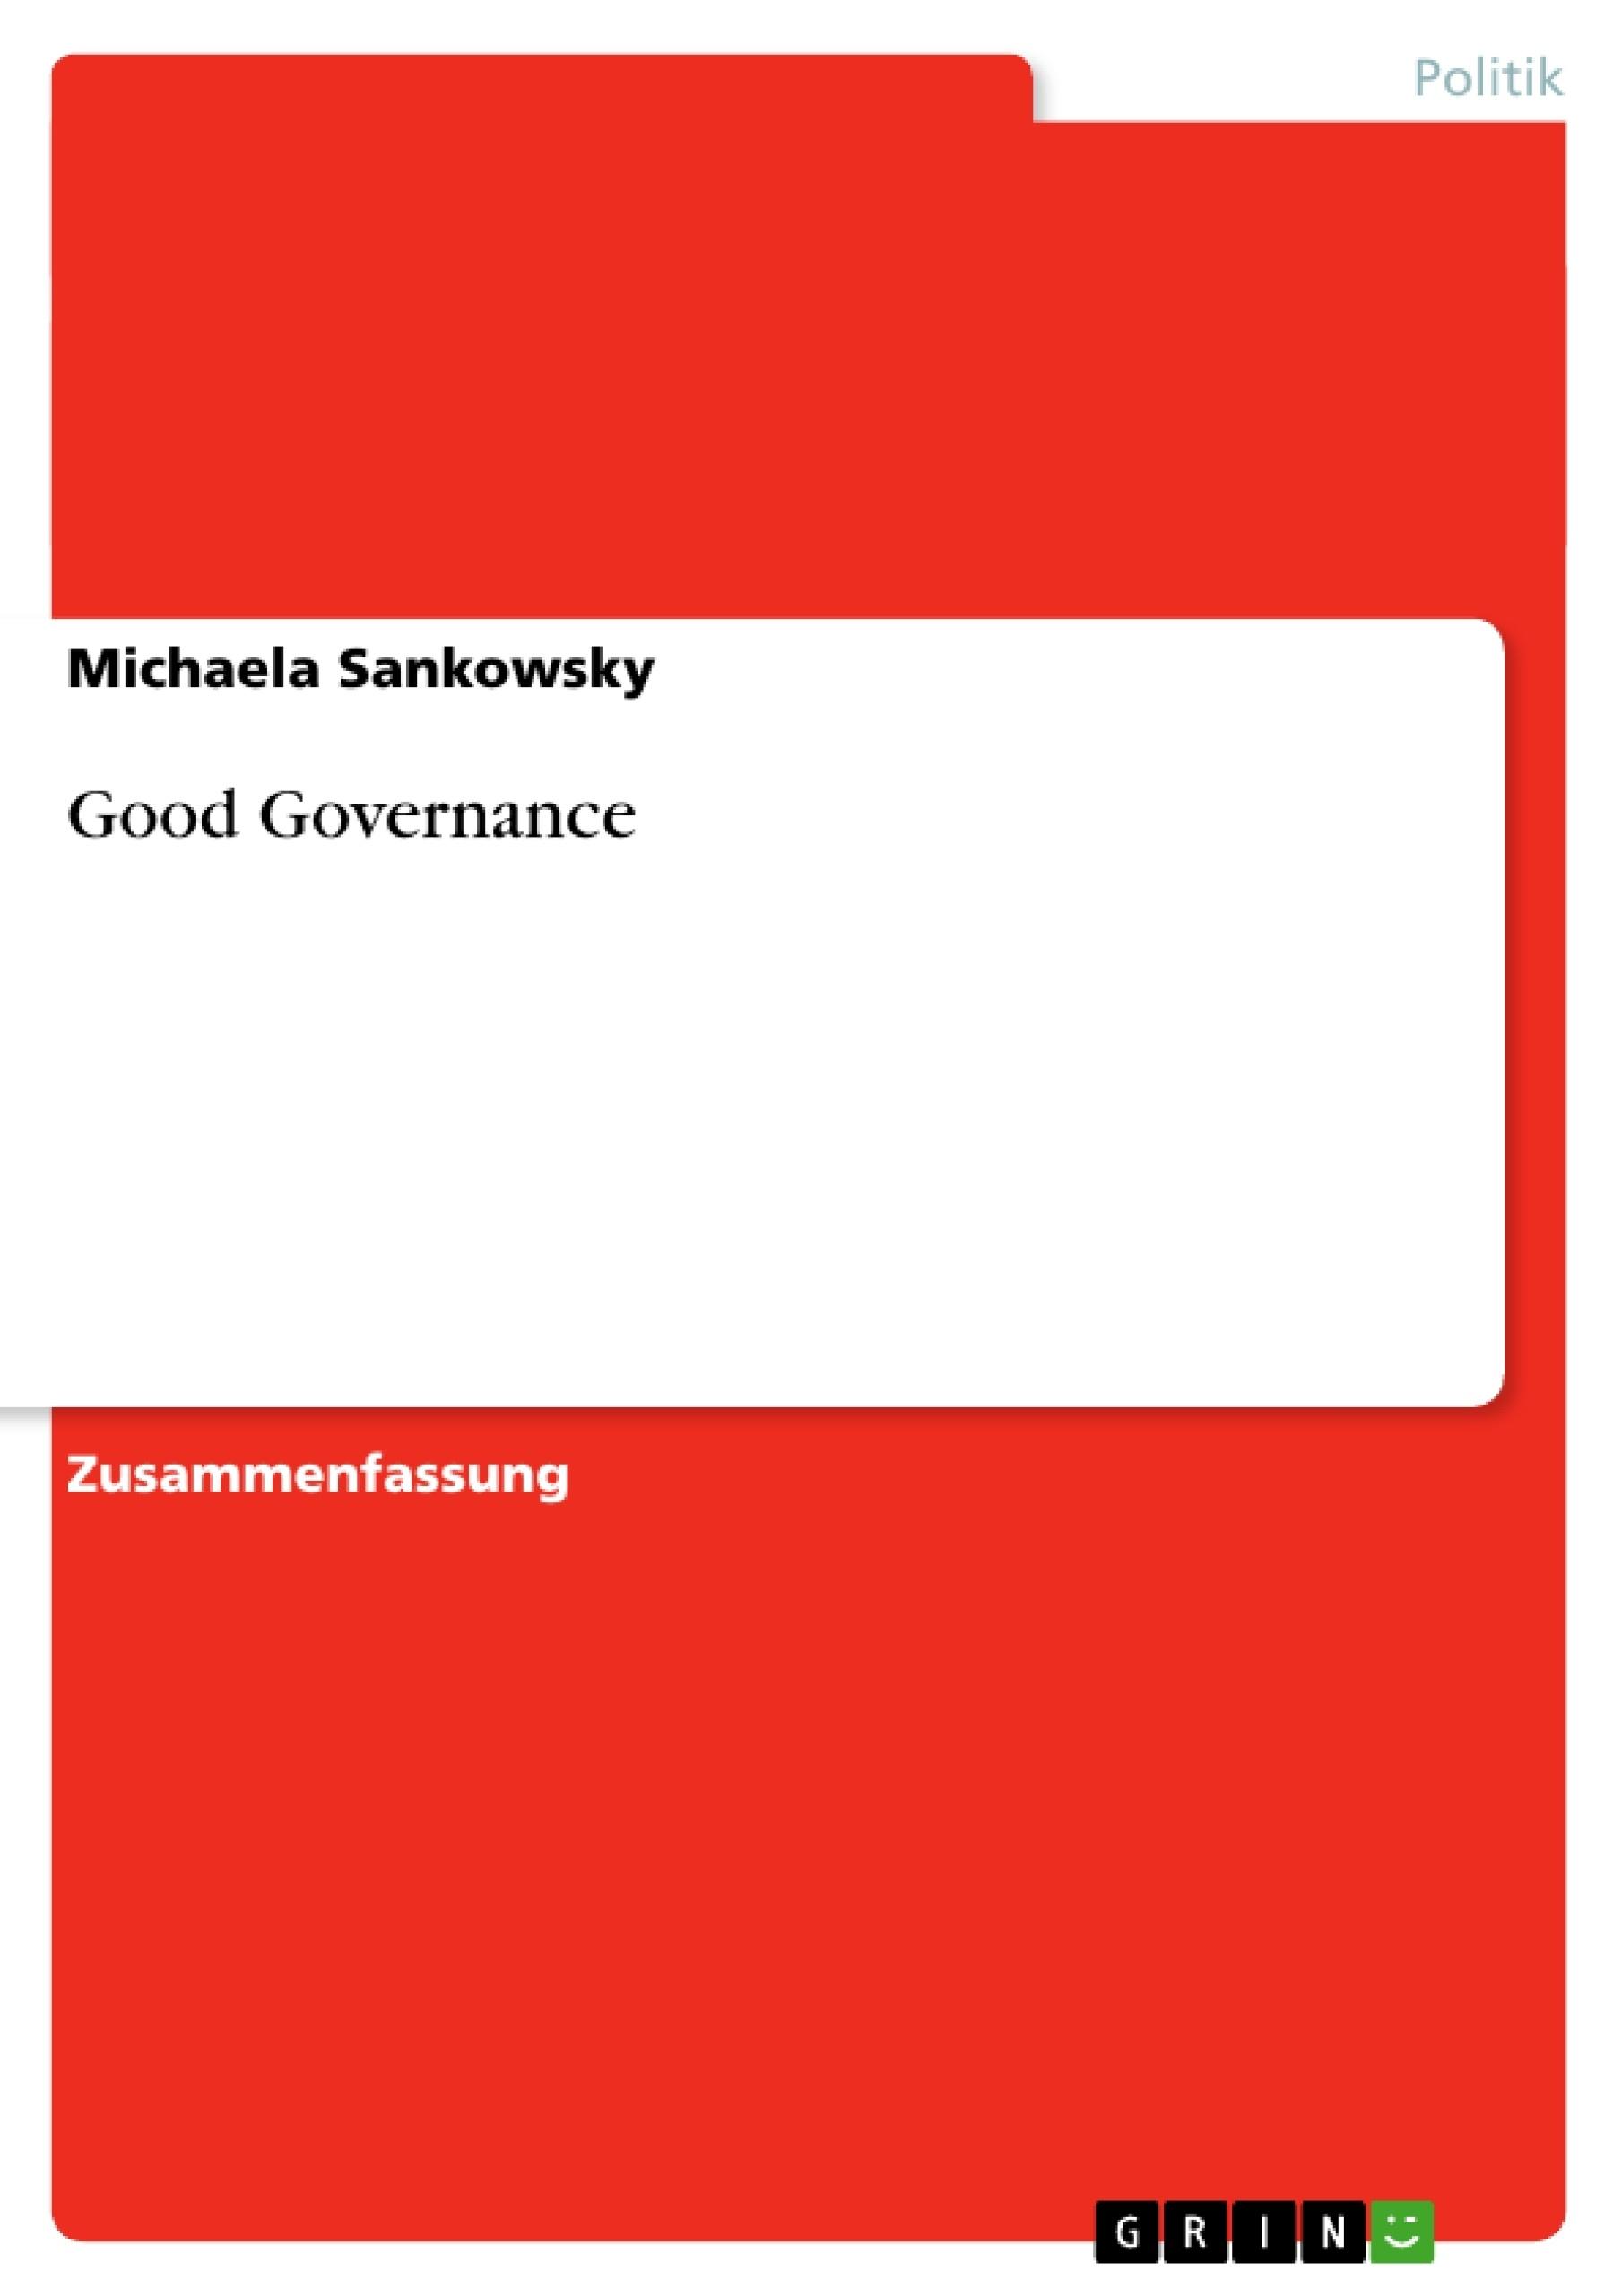 Titel: Good Governance